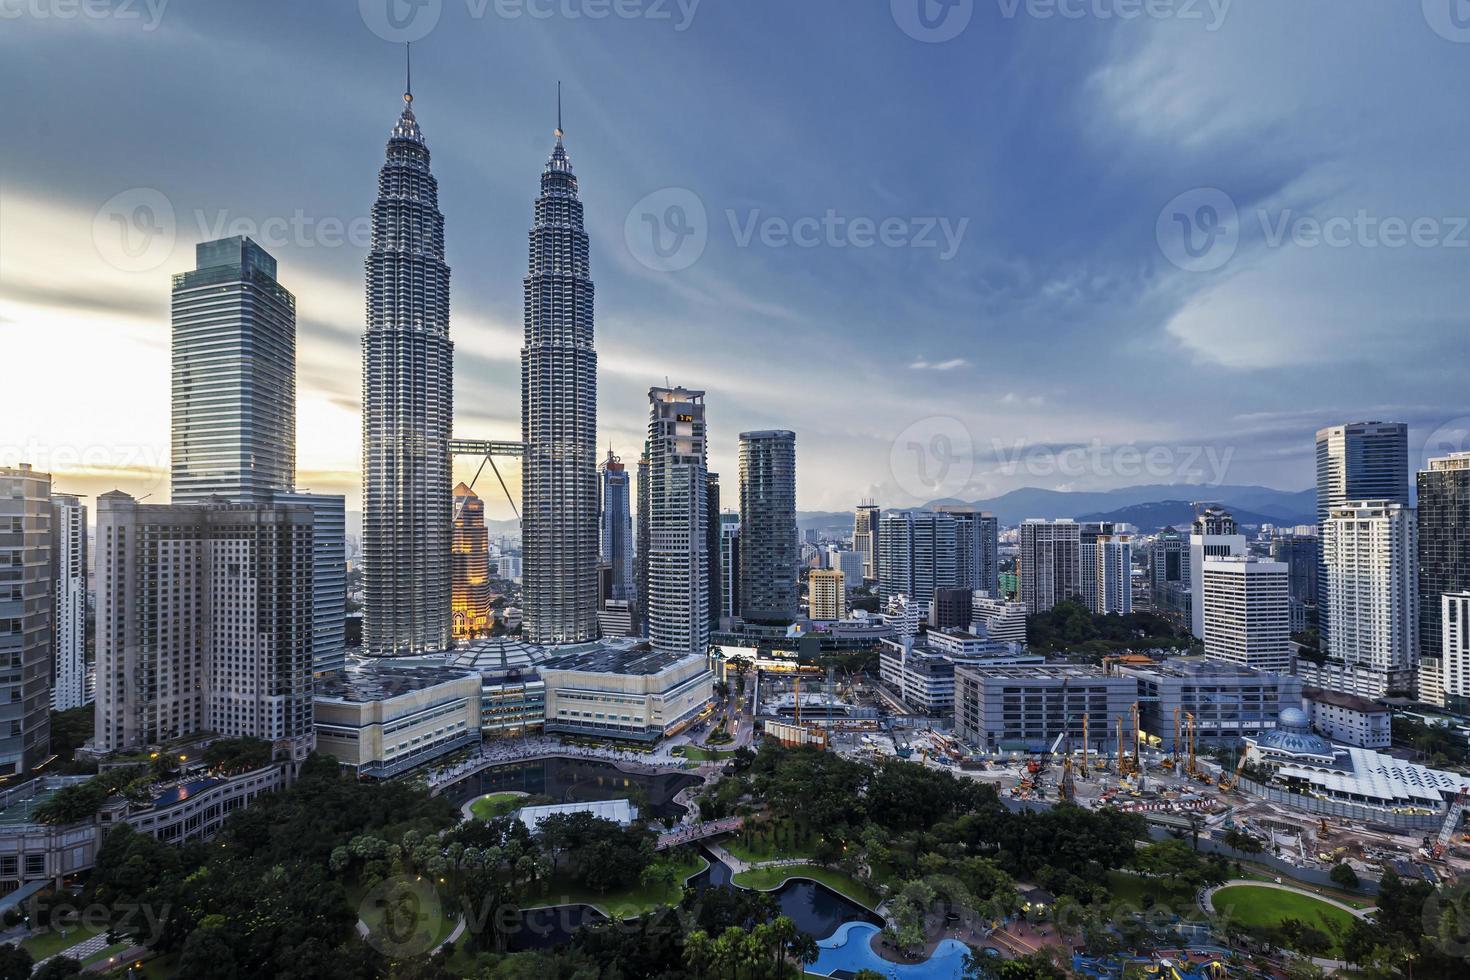 Petronas Towers Kuala Lumpur photo